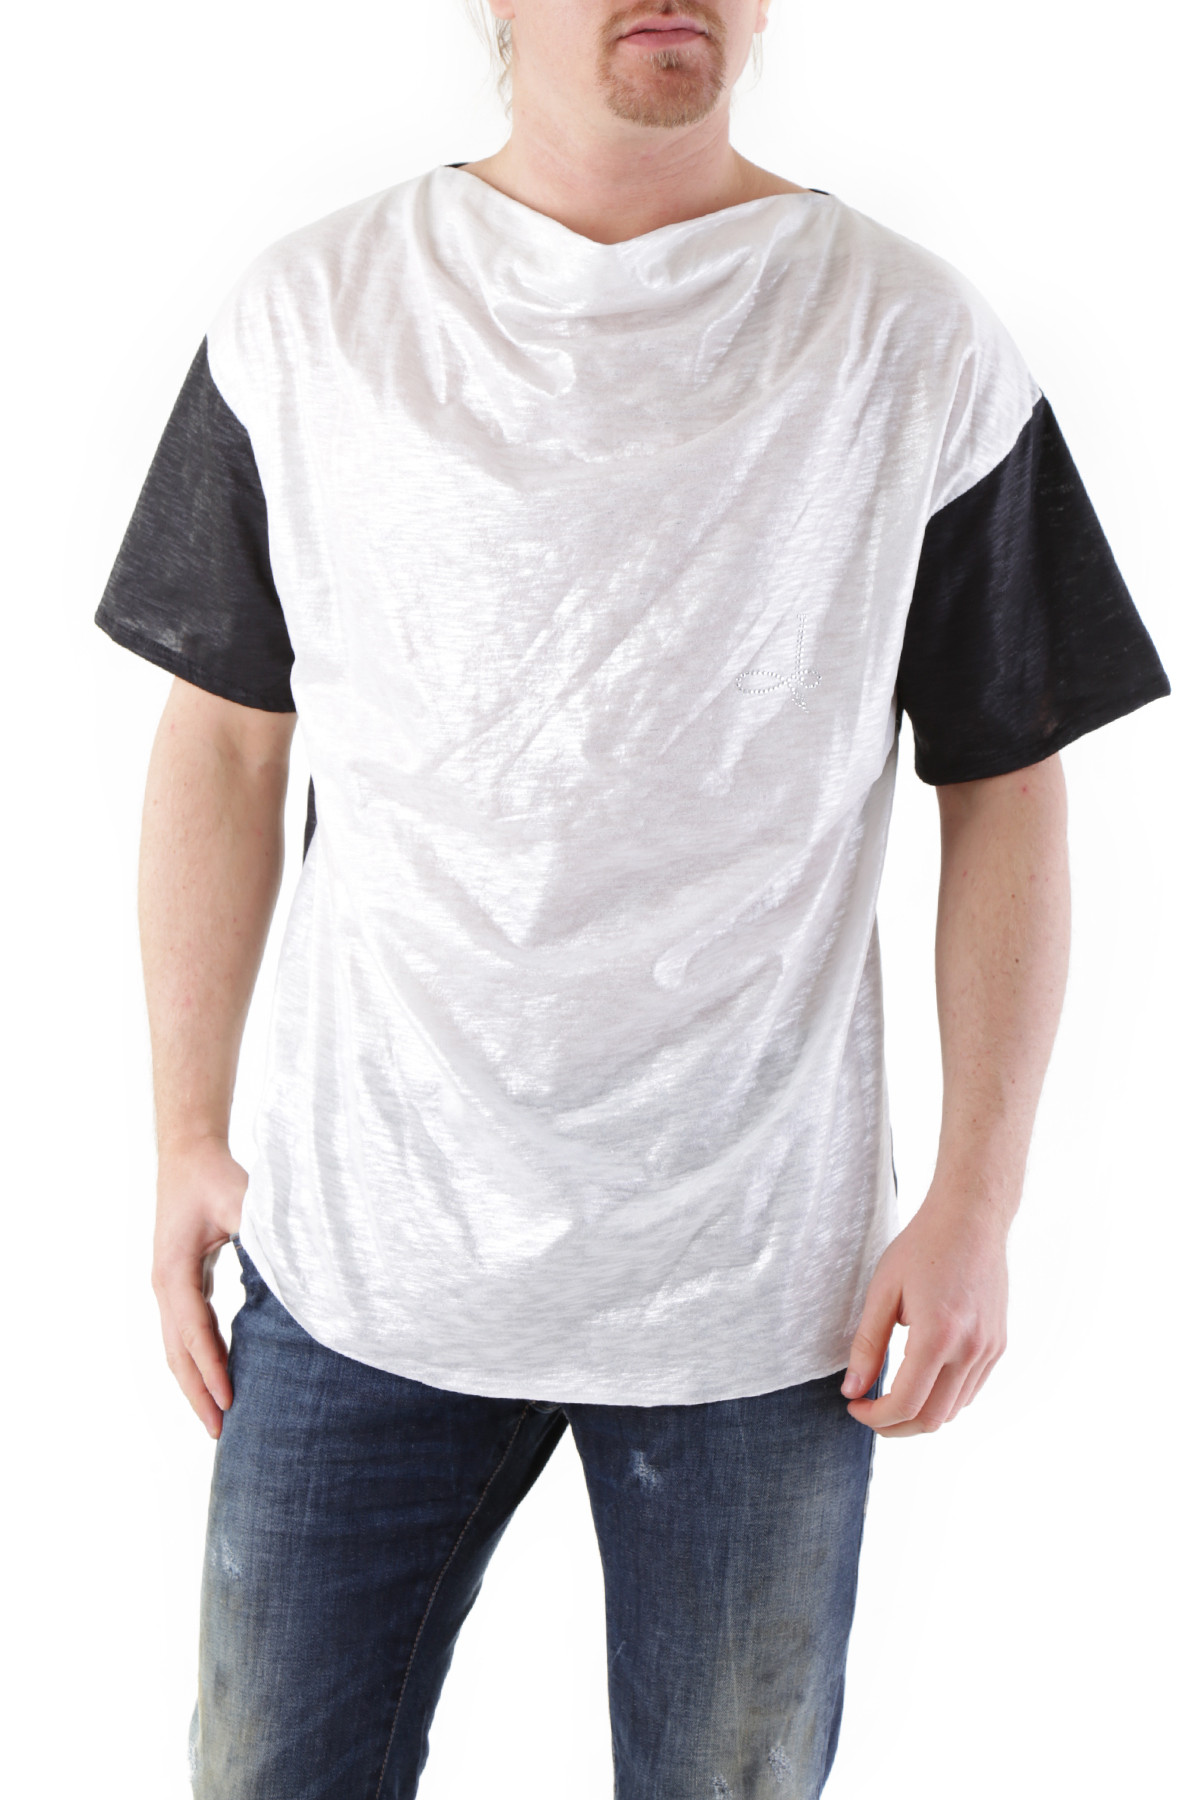 Pánské tričko Absolut Joy - Střibrná   UNIQUE - Glami.cz ea5d2c3e370